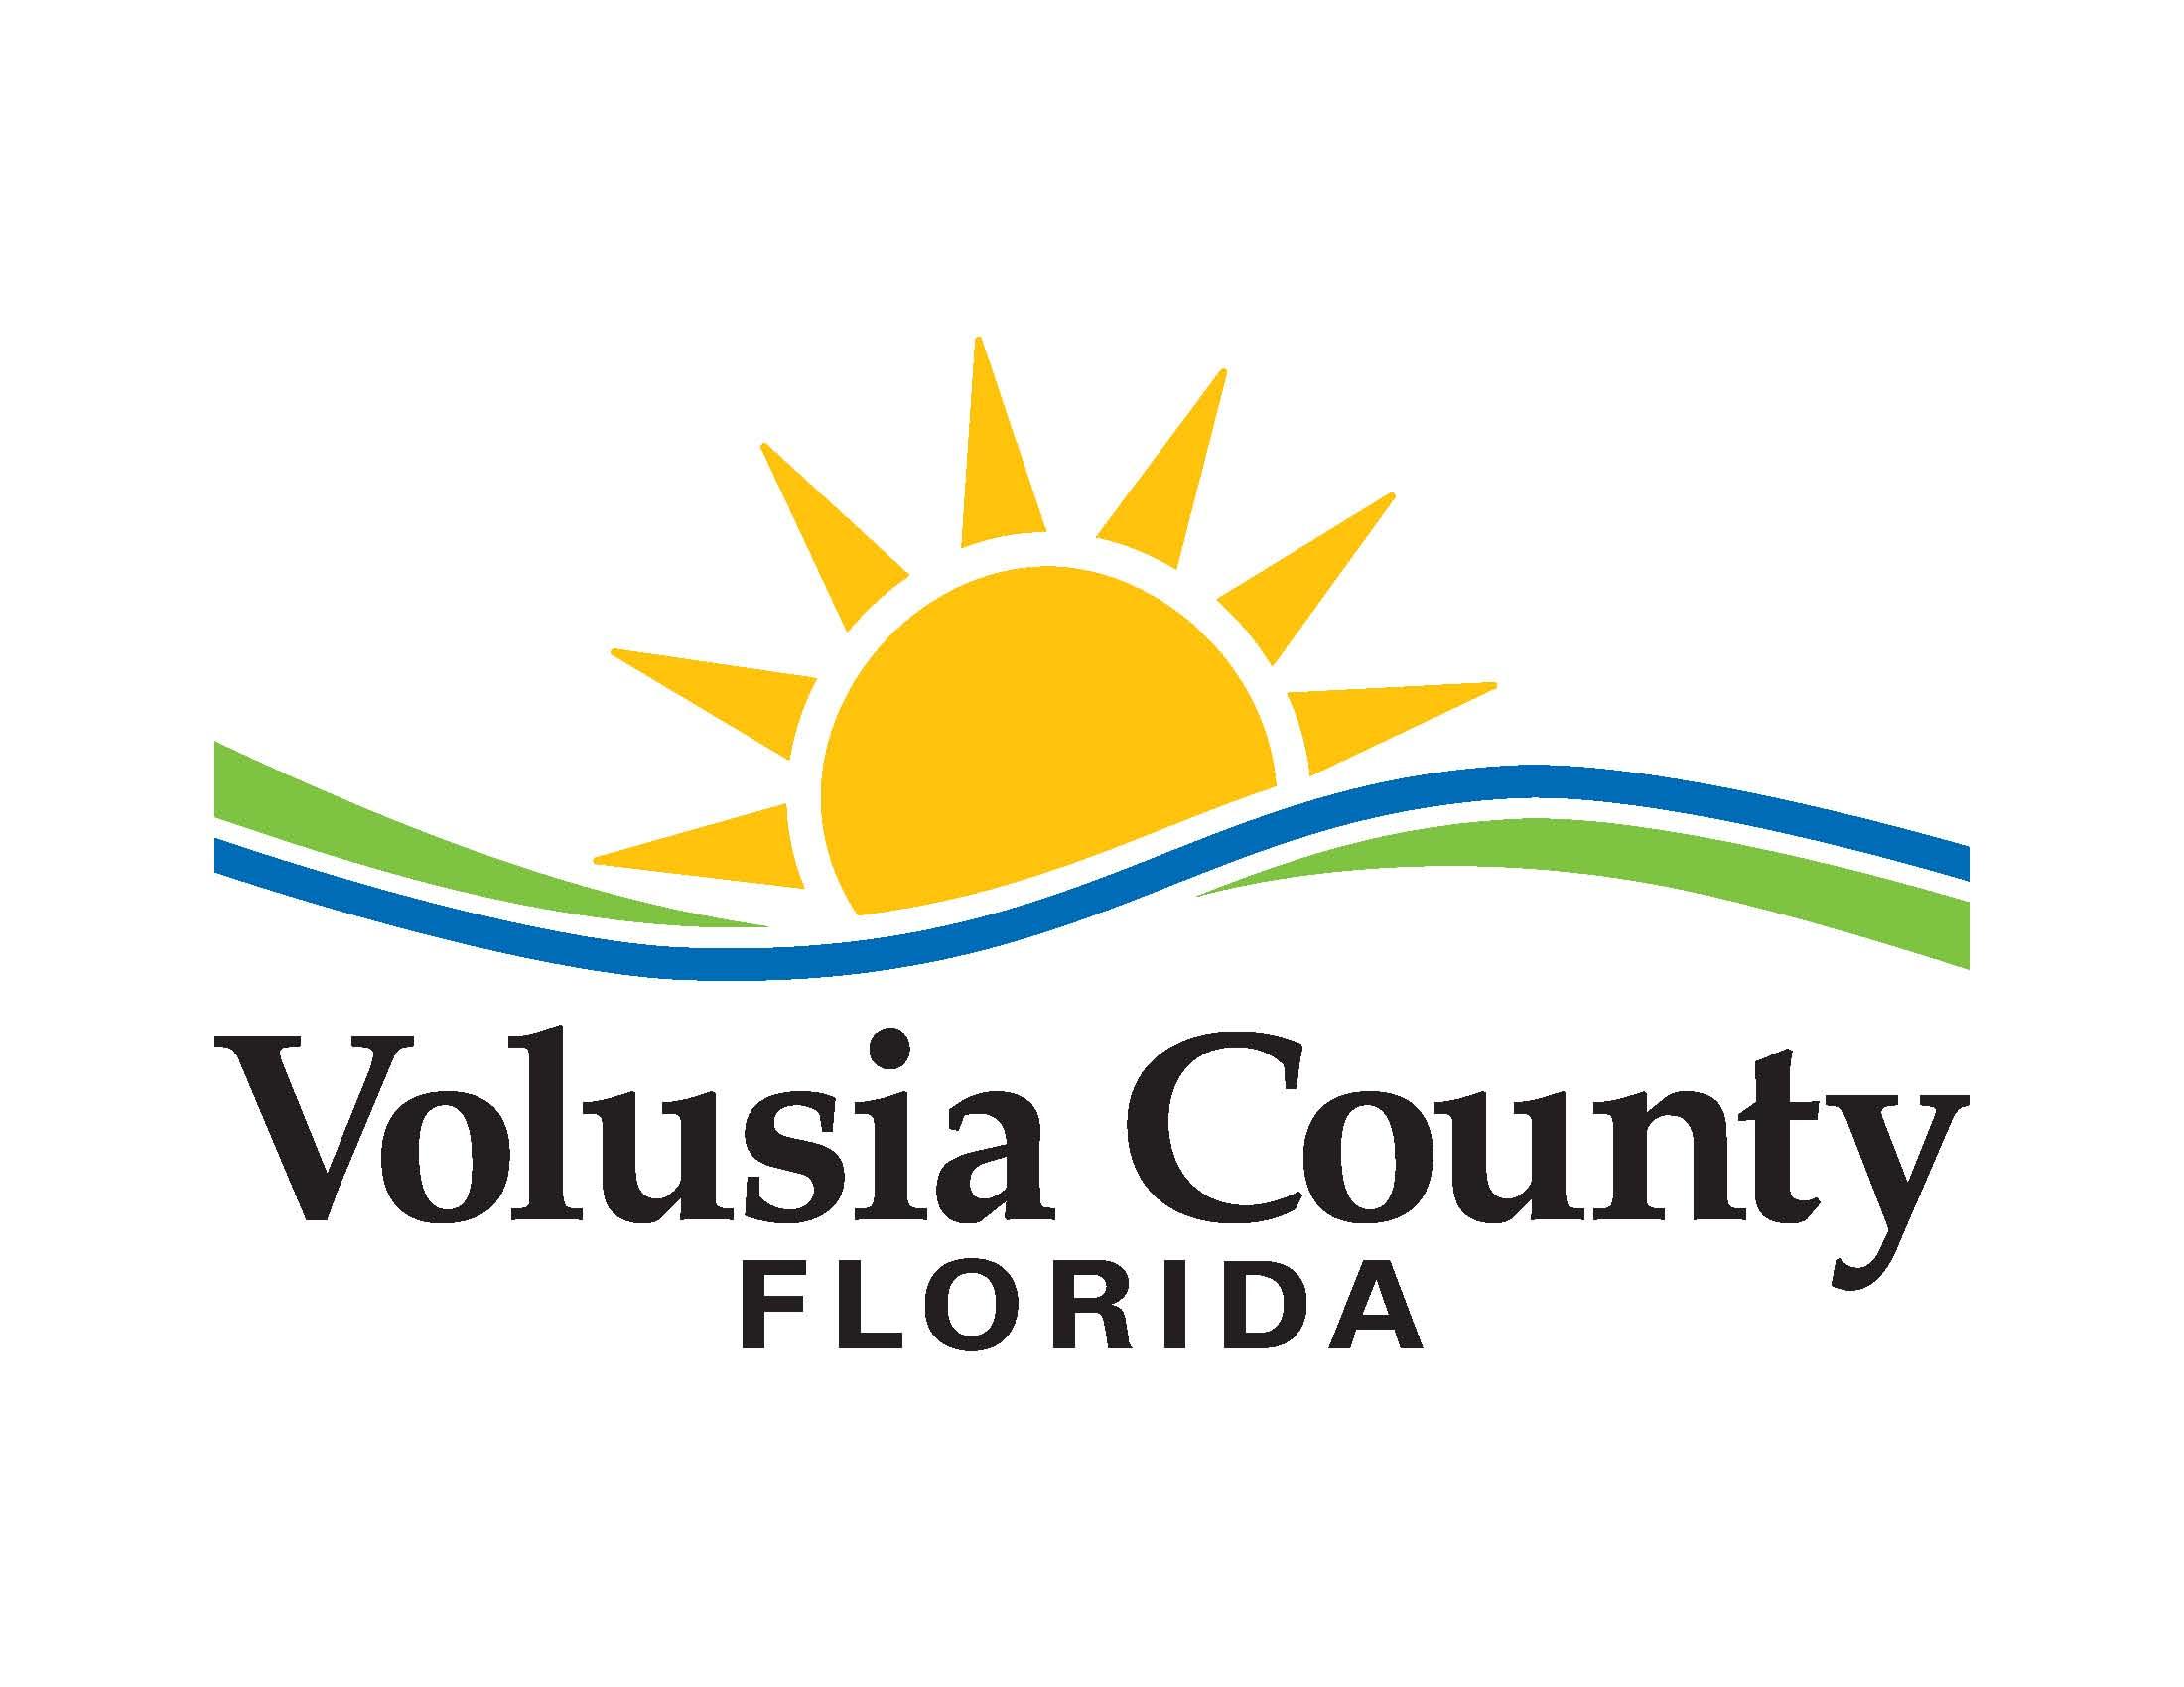 Volusia County Property Taxes